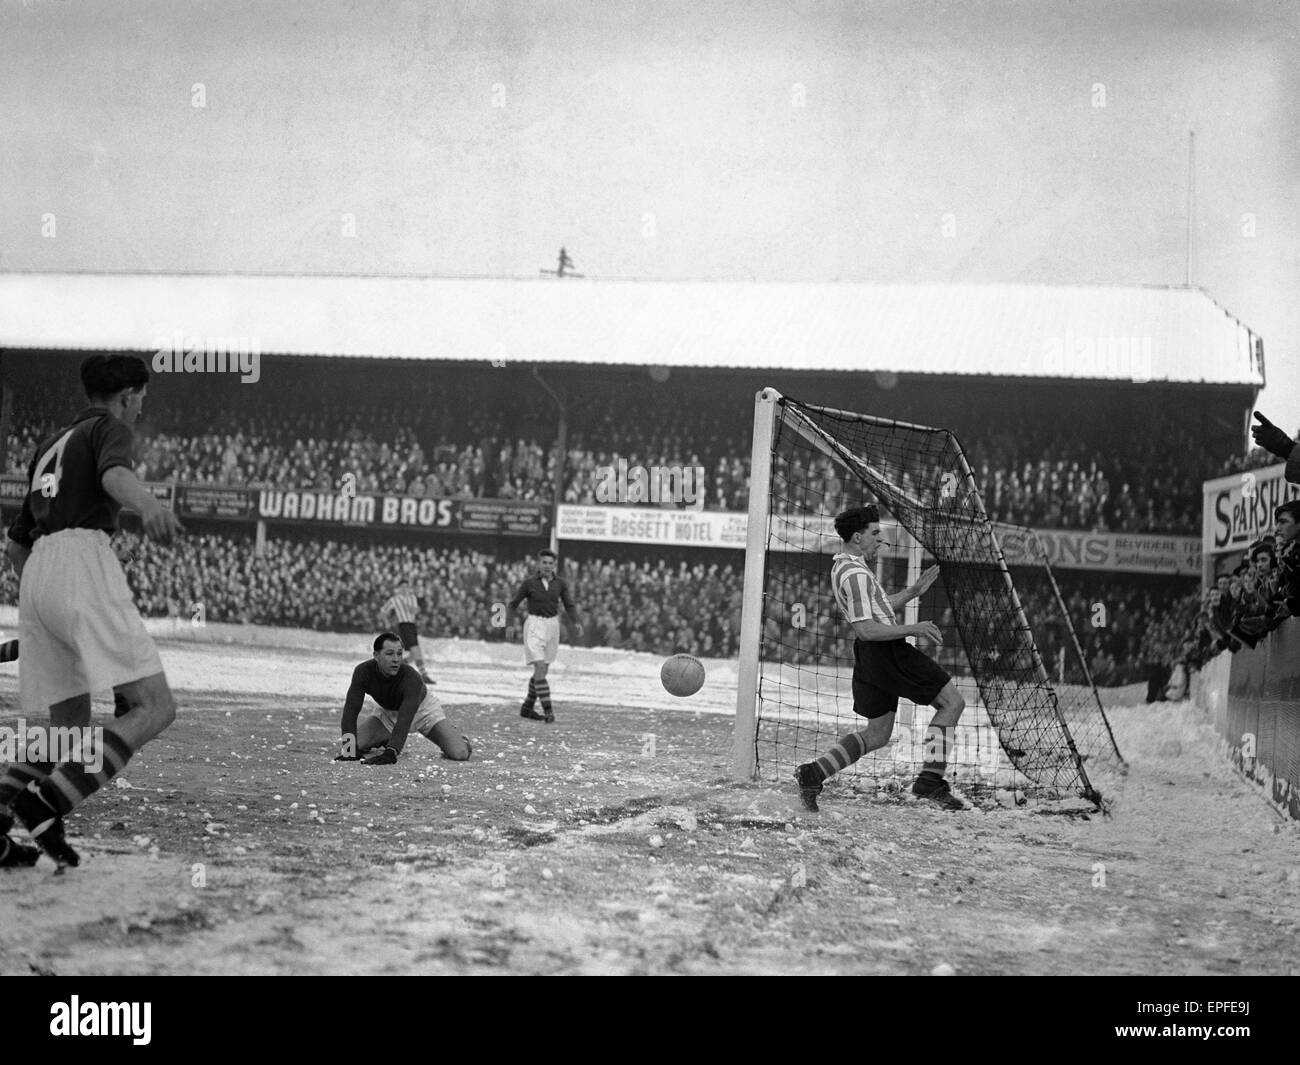 Southampton v Barnsley, partido de Liga en el Dell, Sábado, 16 de diciembre de 1950. Puntuación final: Southampton Barnsley 1-0 Foto de stock